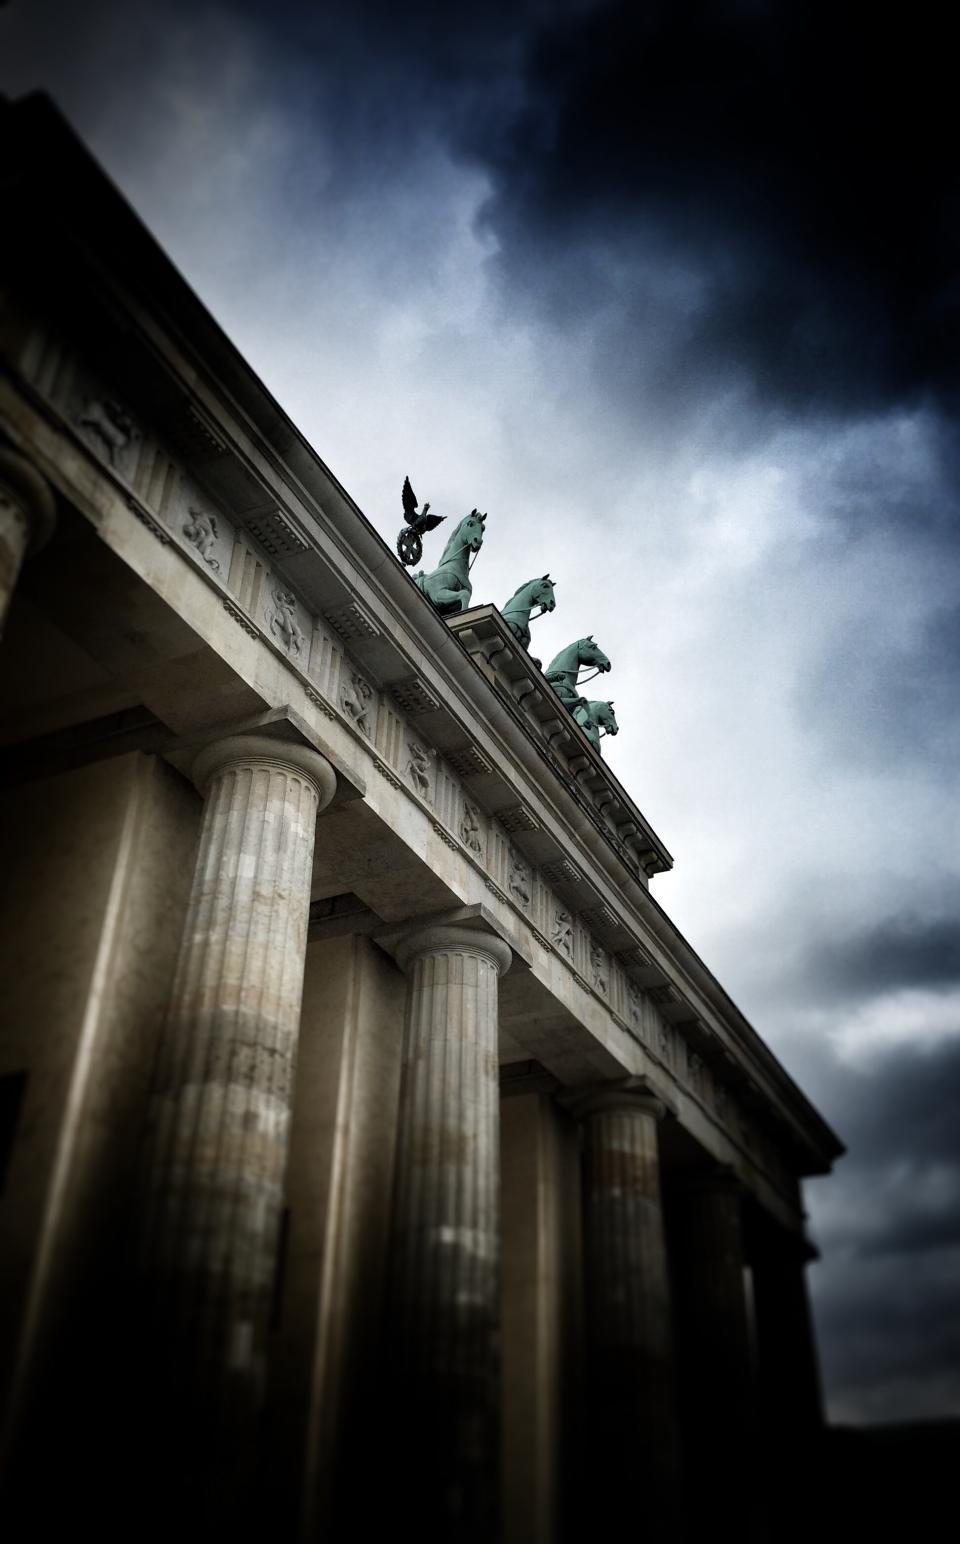 architecture, building, infrastructure, clouds, sky, sculpture, dark